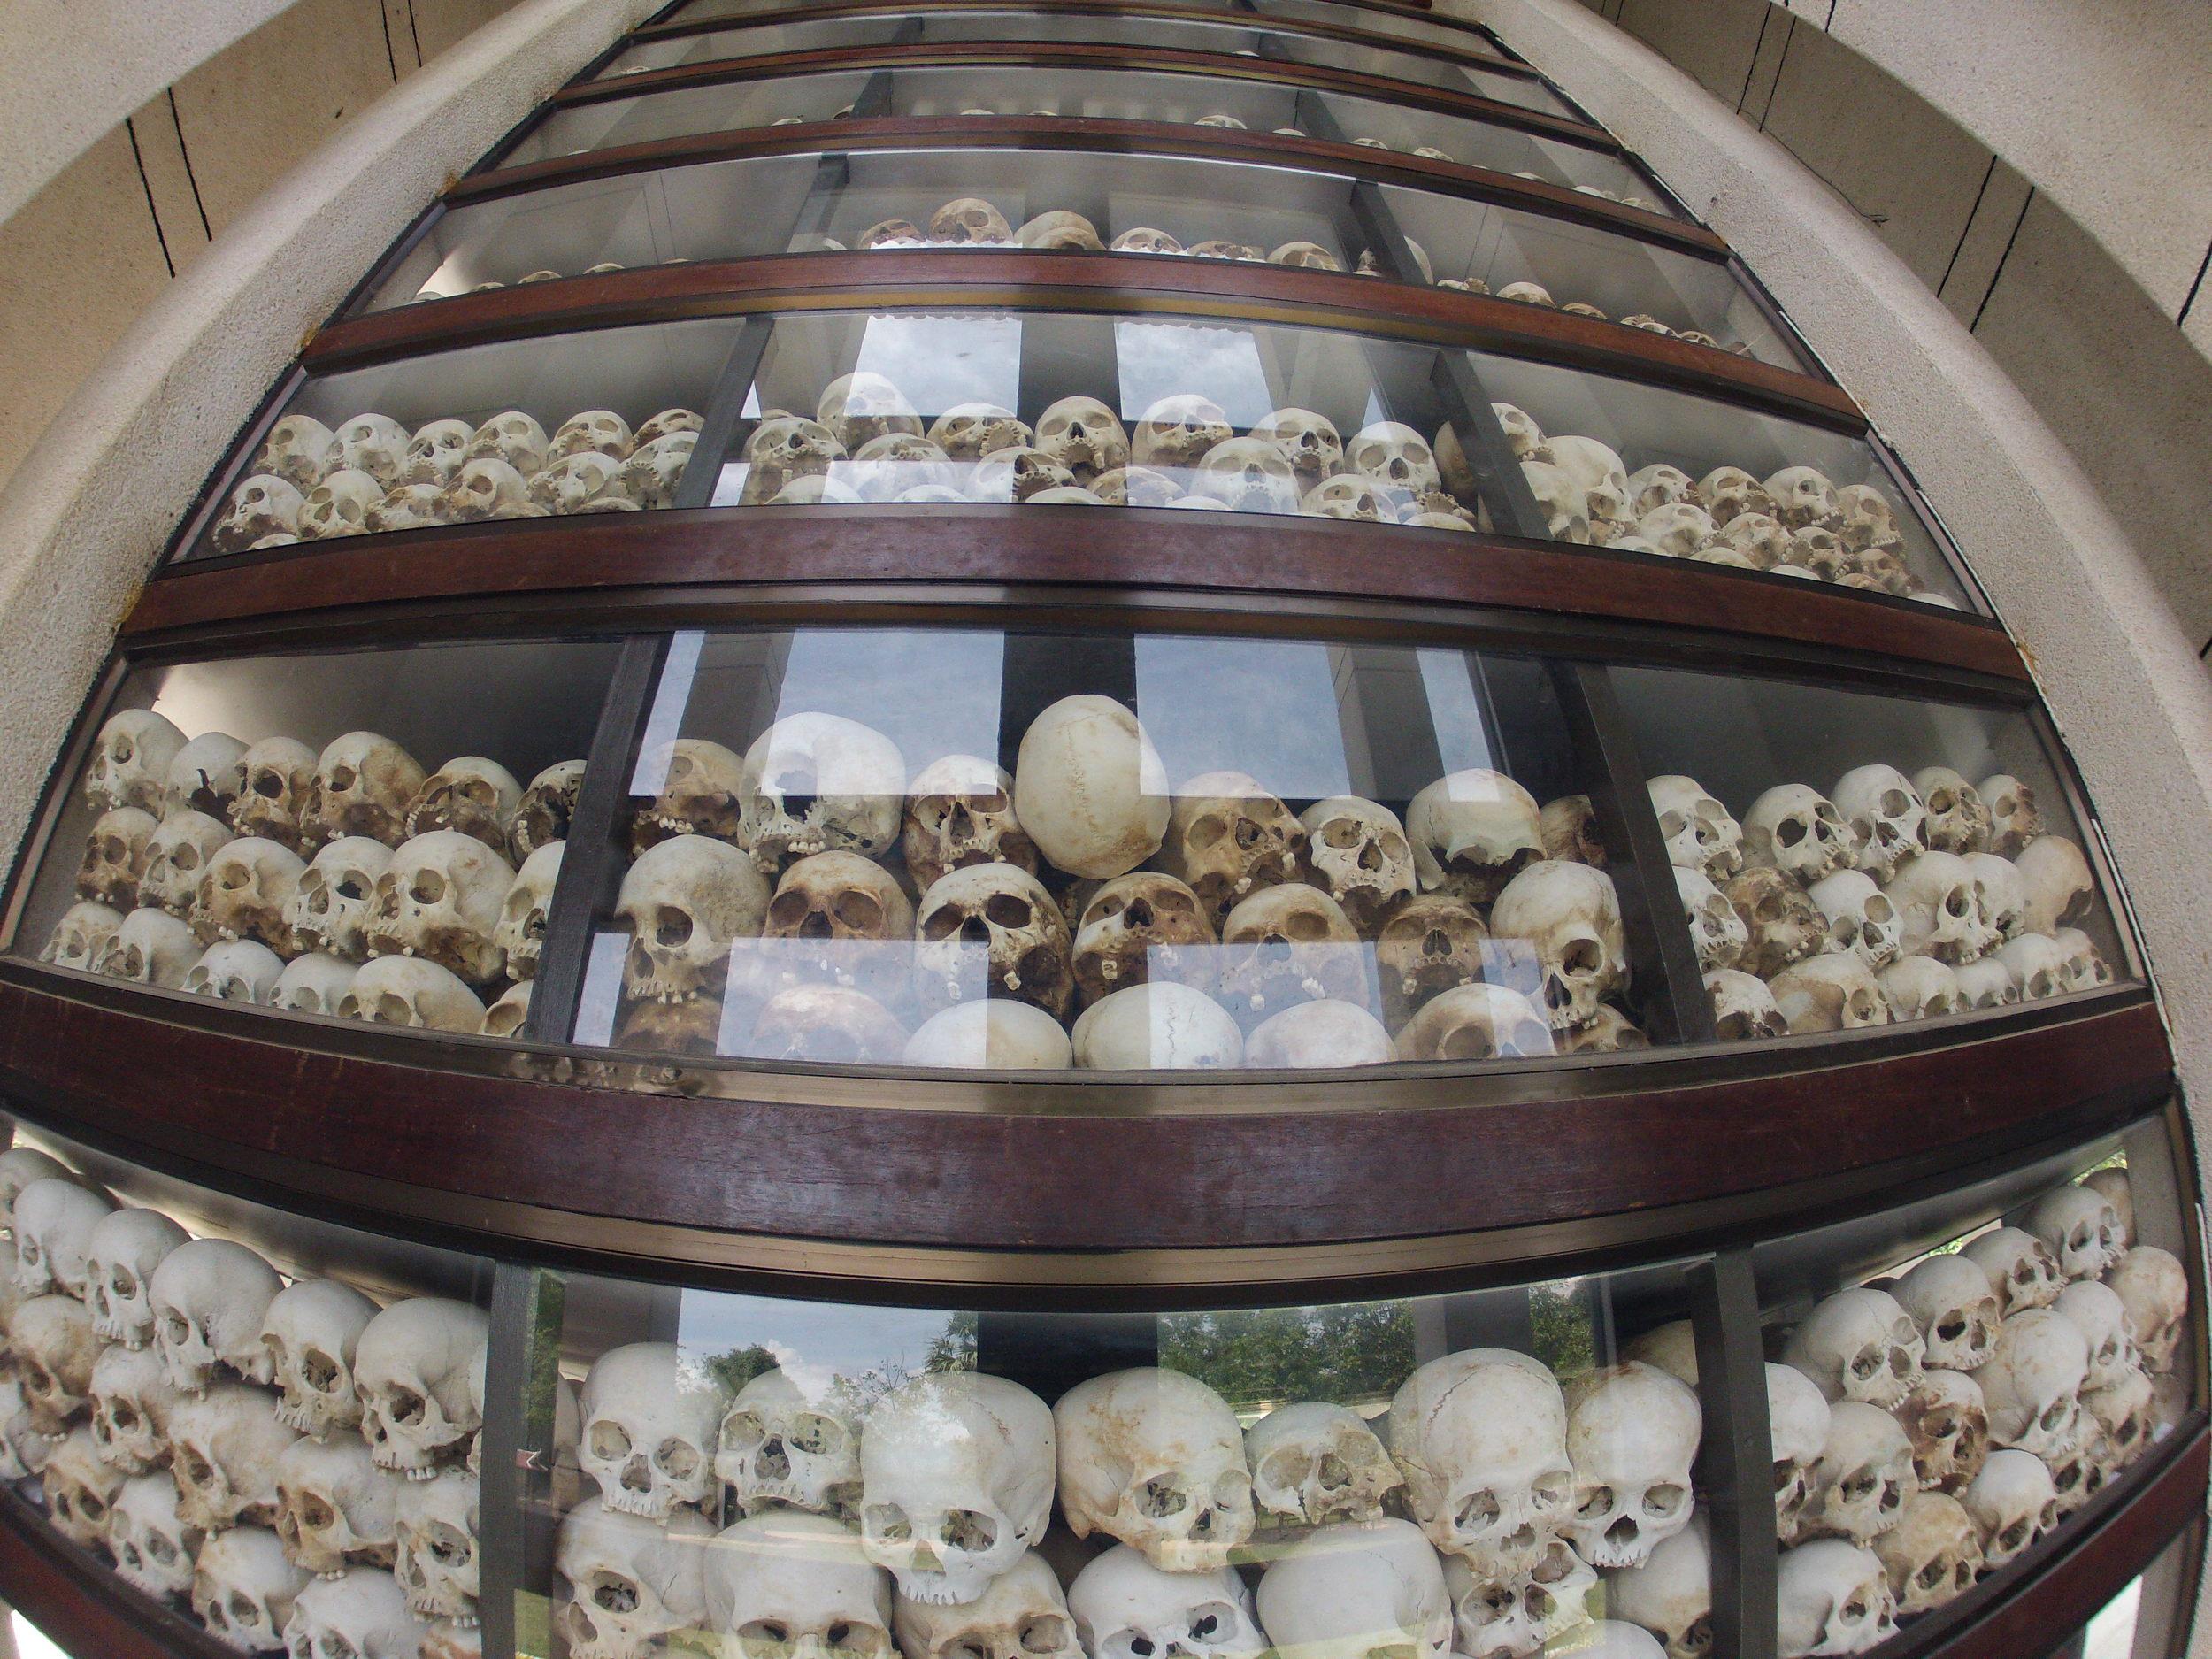 The Choeung Ek Genocidal Center, Killing Fields Museum in Phnom Penh